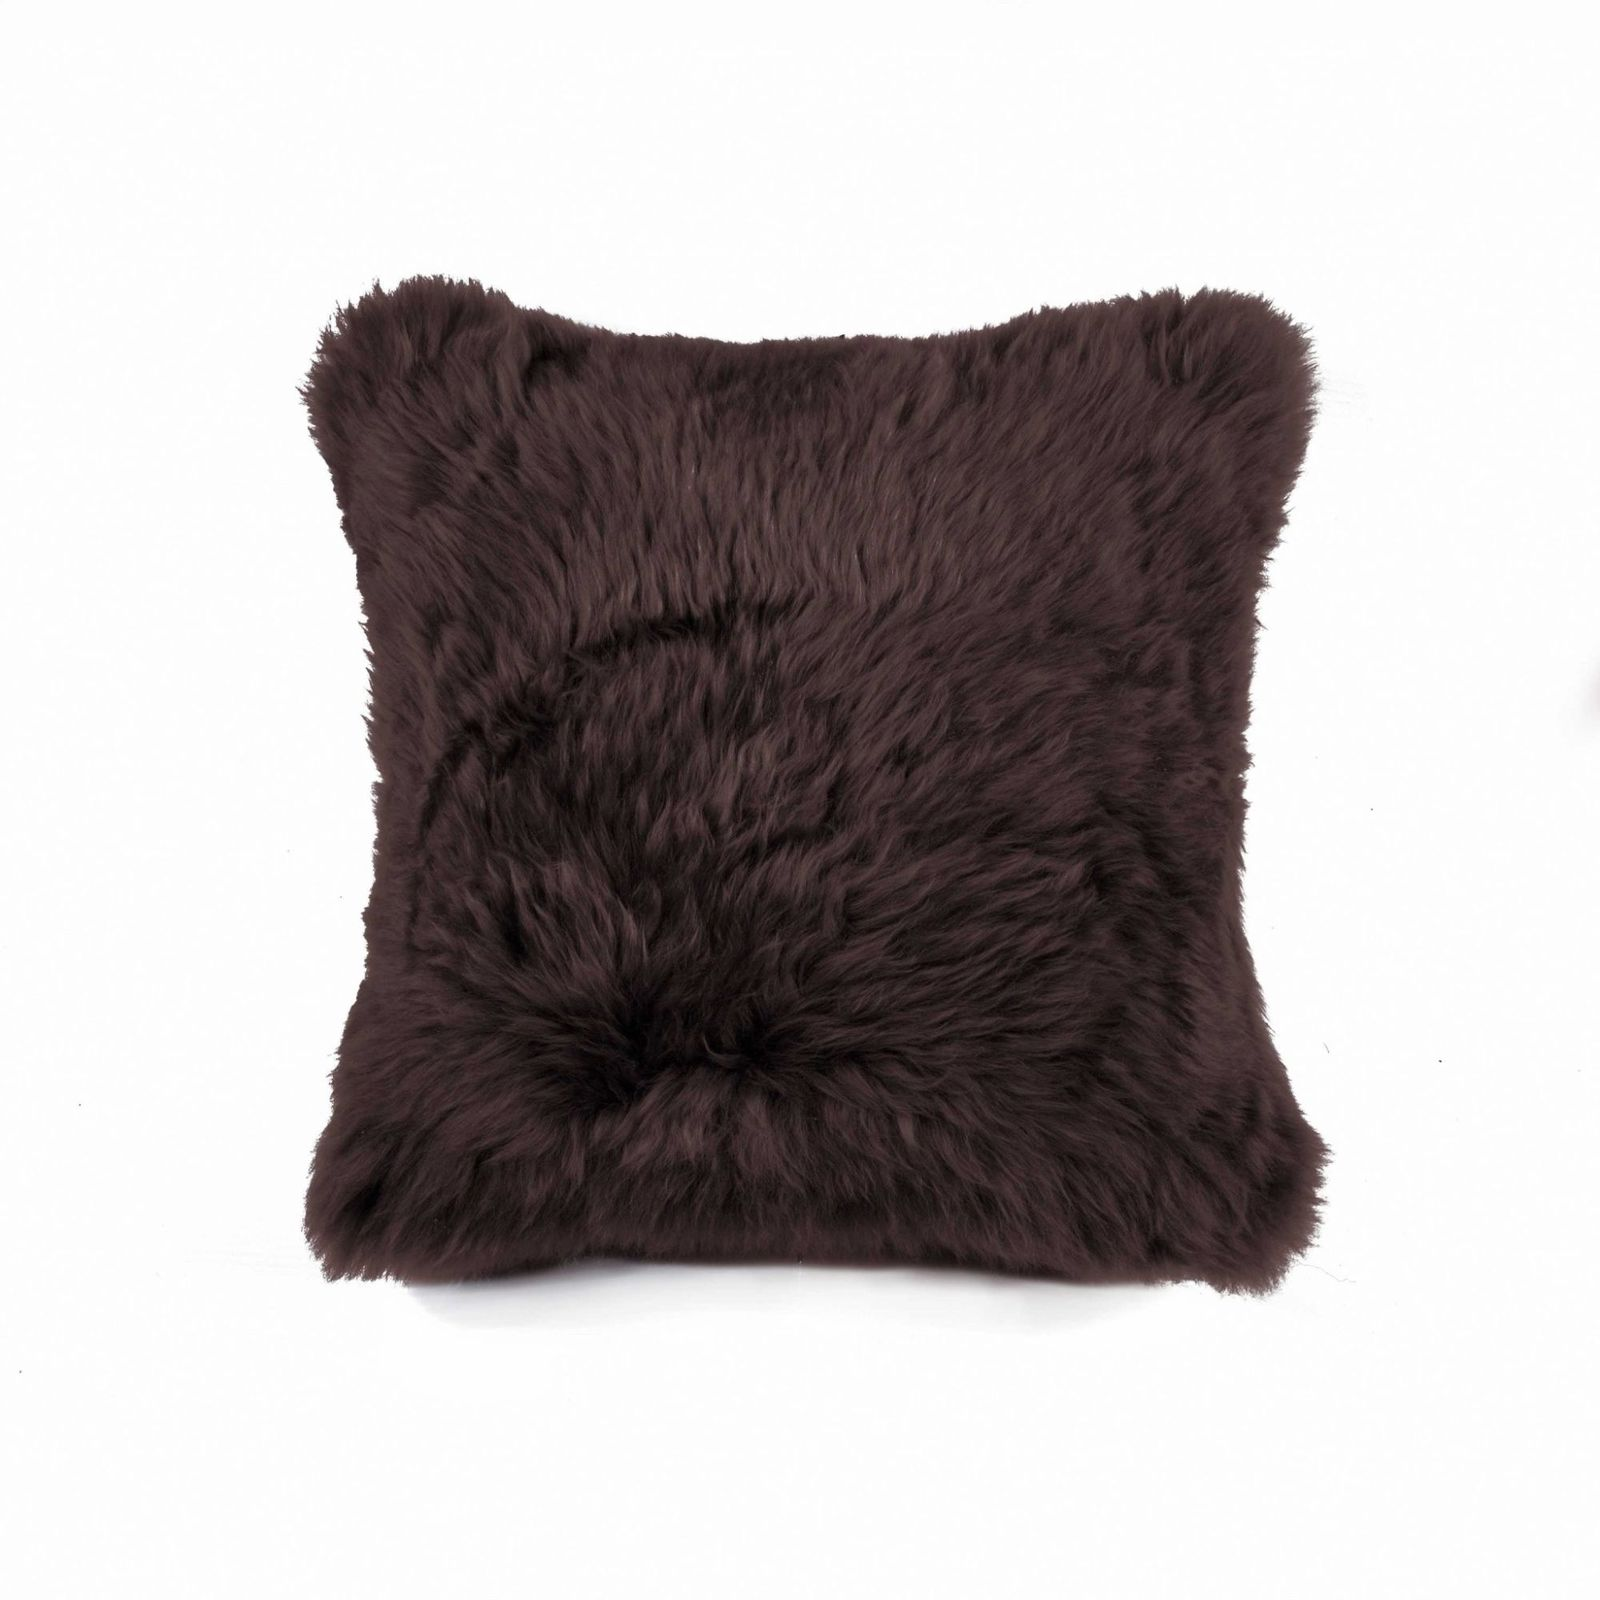 "HomeRoots Kitchen 18"" x 18"" x 5"" Chocolate Sheepskin Throw Pillow - $64.05"